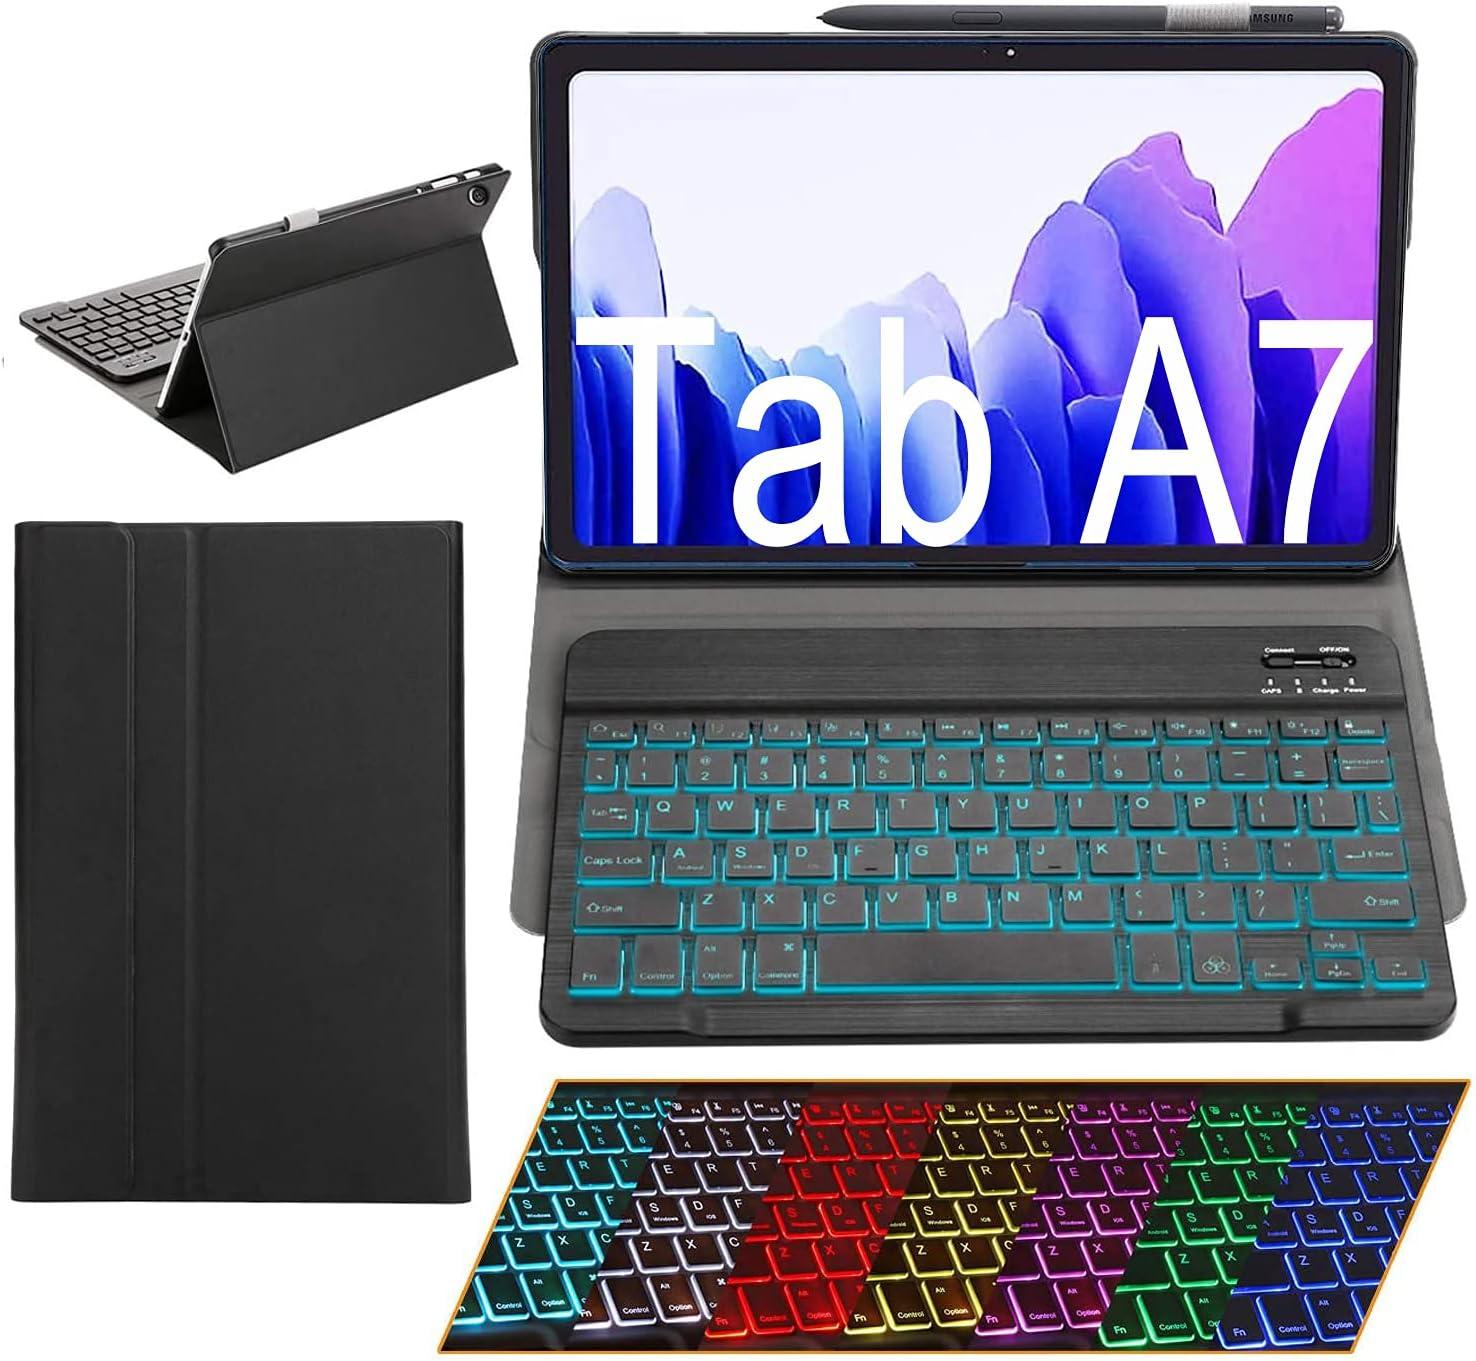 Samsung Galaxy Tab A7 Case with Keyboard Ultra-Thin PU Leather Slim Folio Stand Cover Removable Wireless Bluetooth Backlit Keyboard for 2020 Galaxy Tab A7 10.4